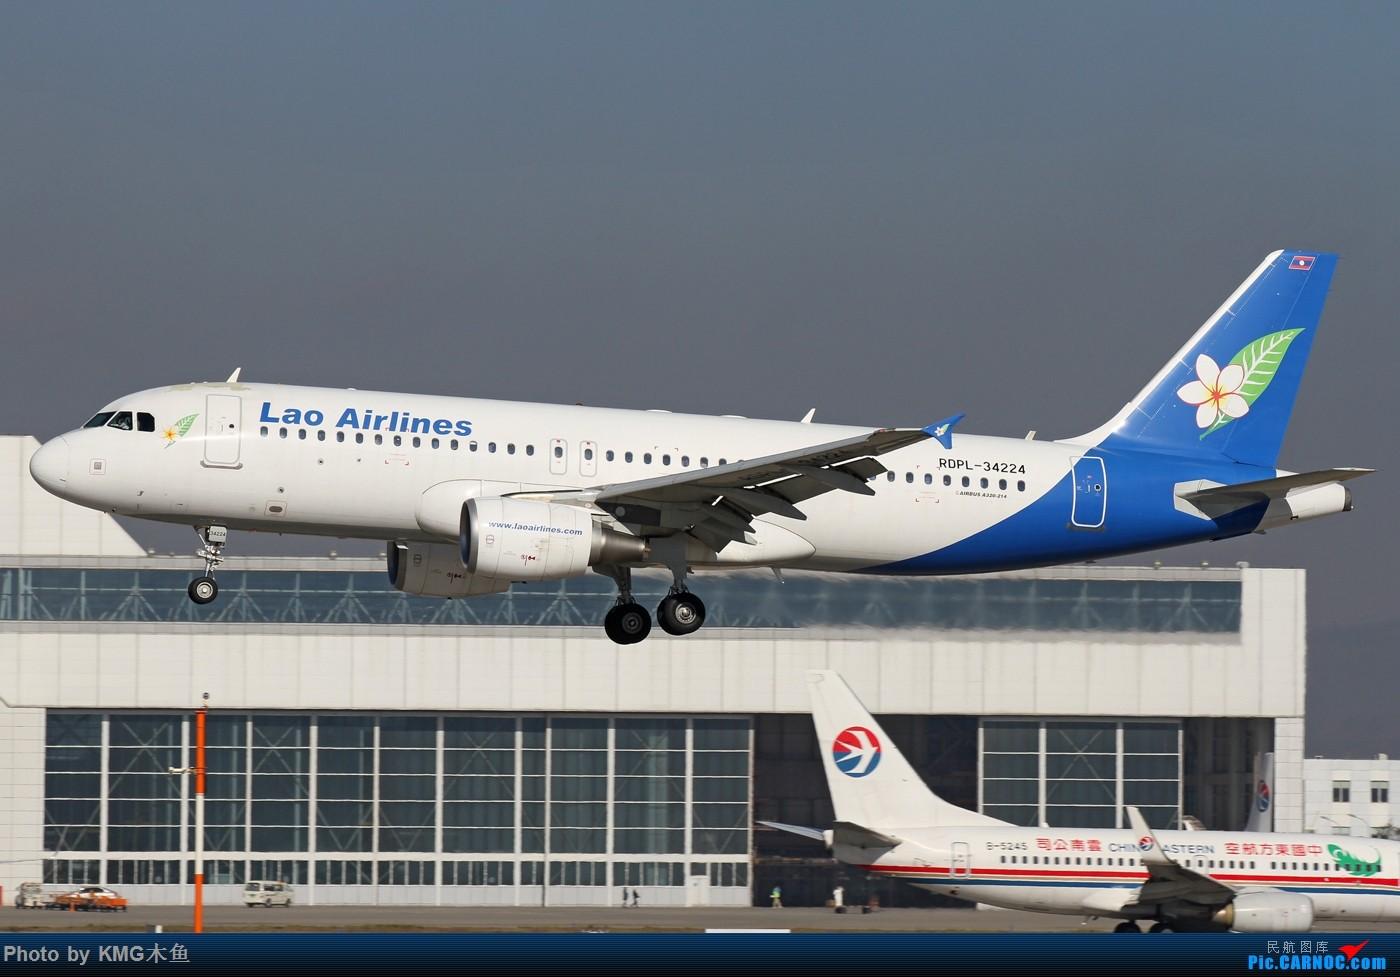 Re:[原创]【KMG昆明长水国际机场】好天气,拍到了好灰机,愉快的一天 AIRBUS A321-200 RDPL-34224 中国昆明长水国际机场